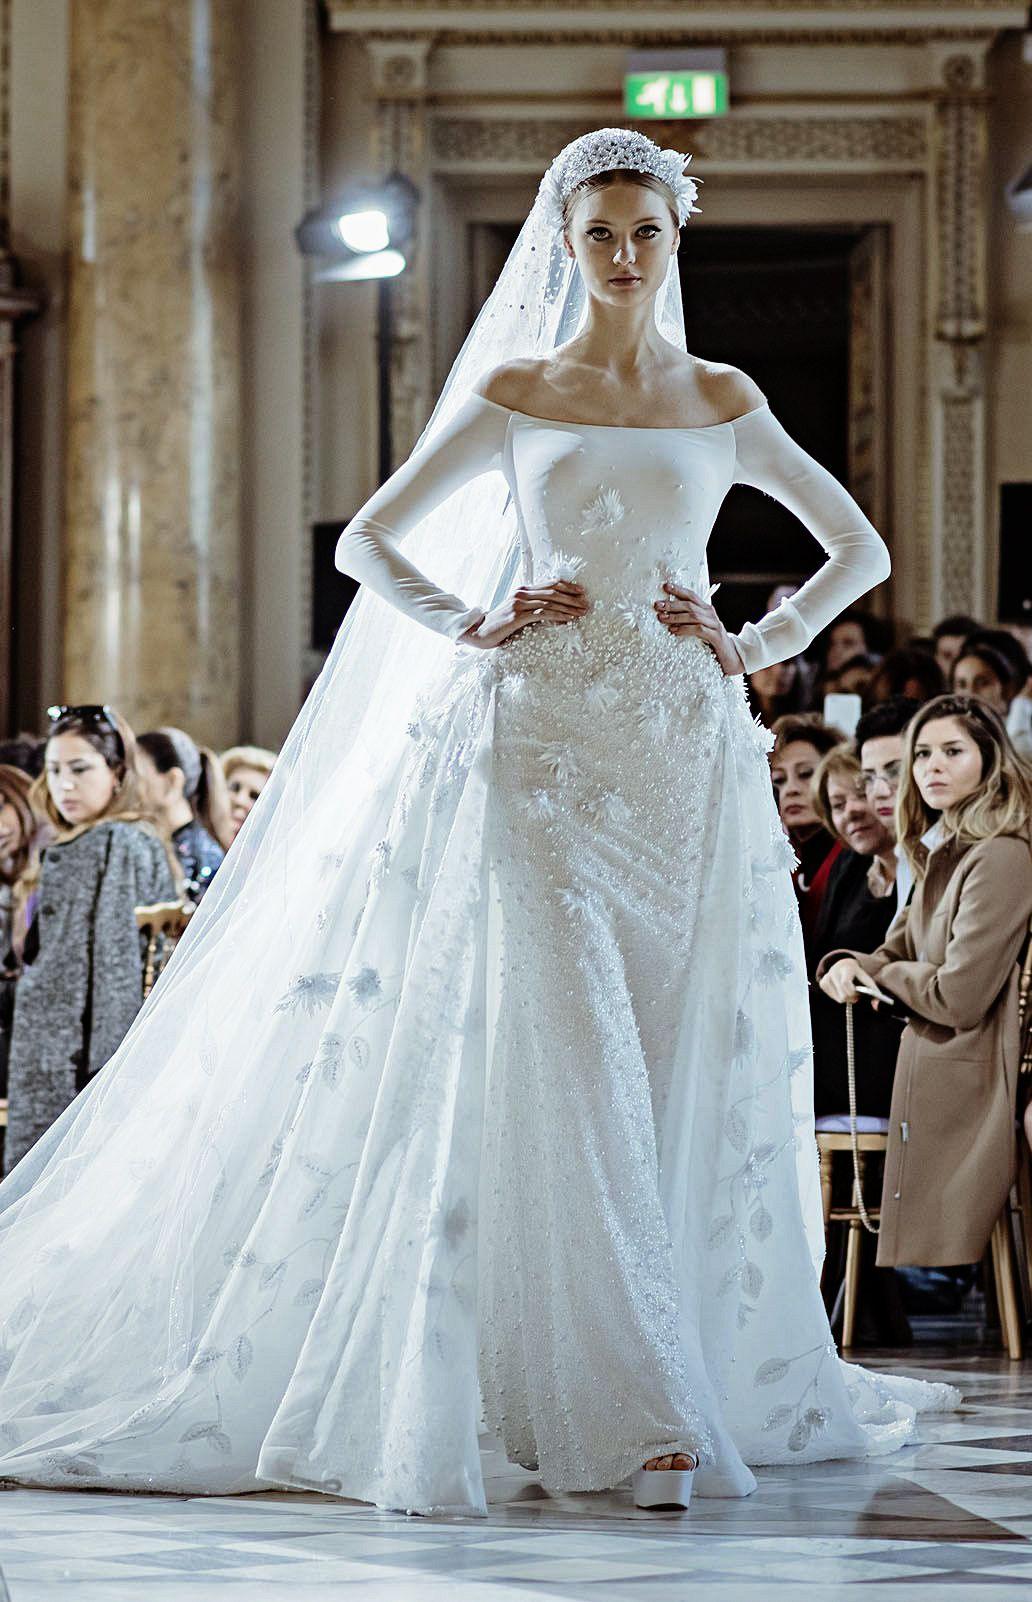 Fine Vestidos Novia Gijon Vignette - All Wedding Dresses ...